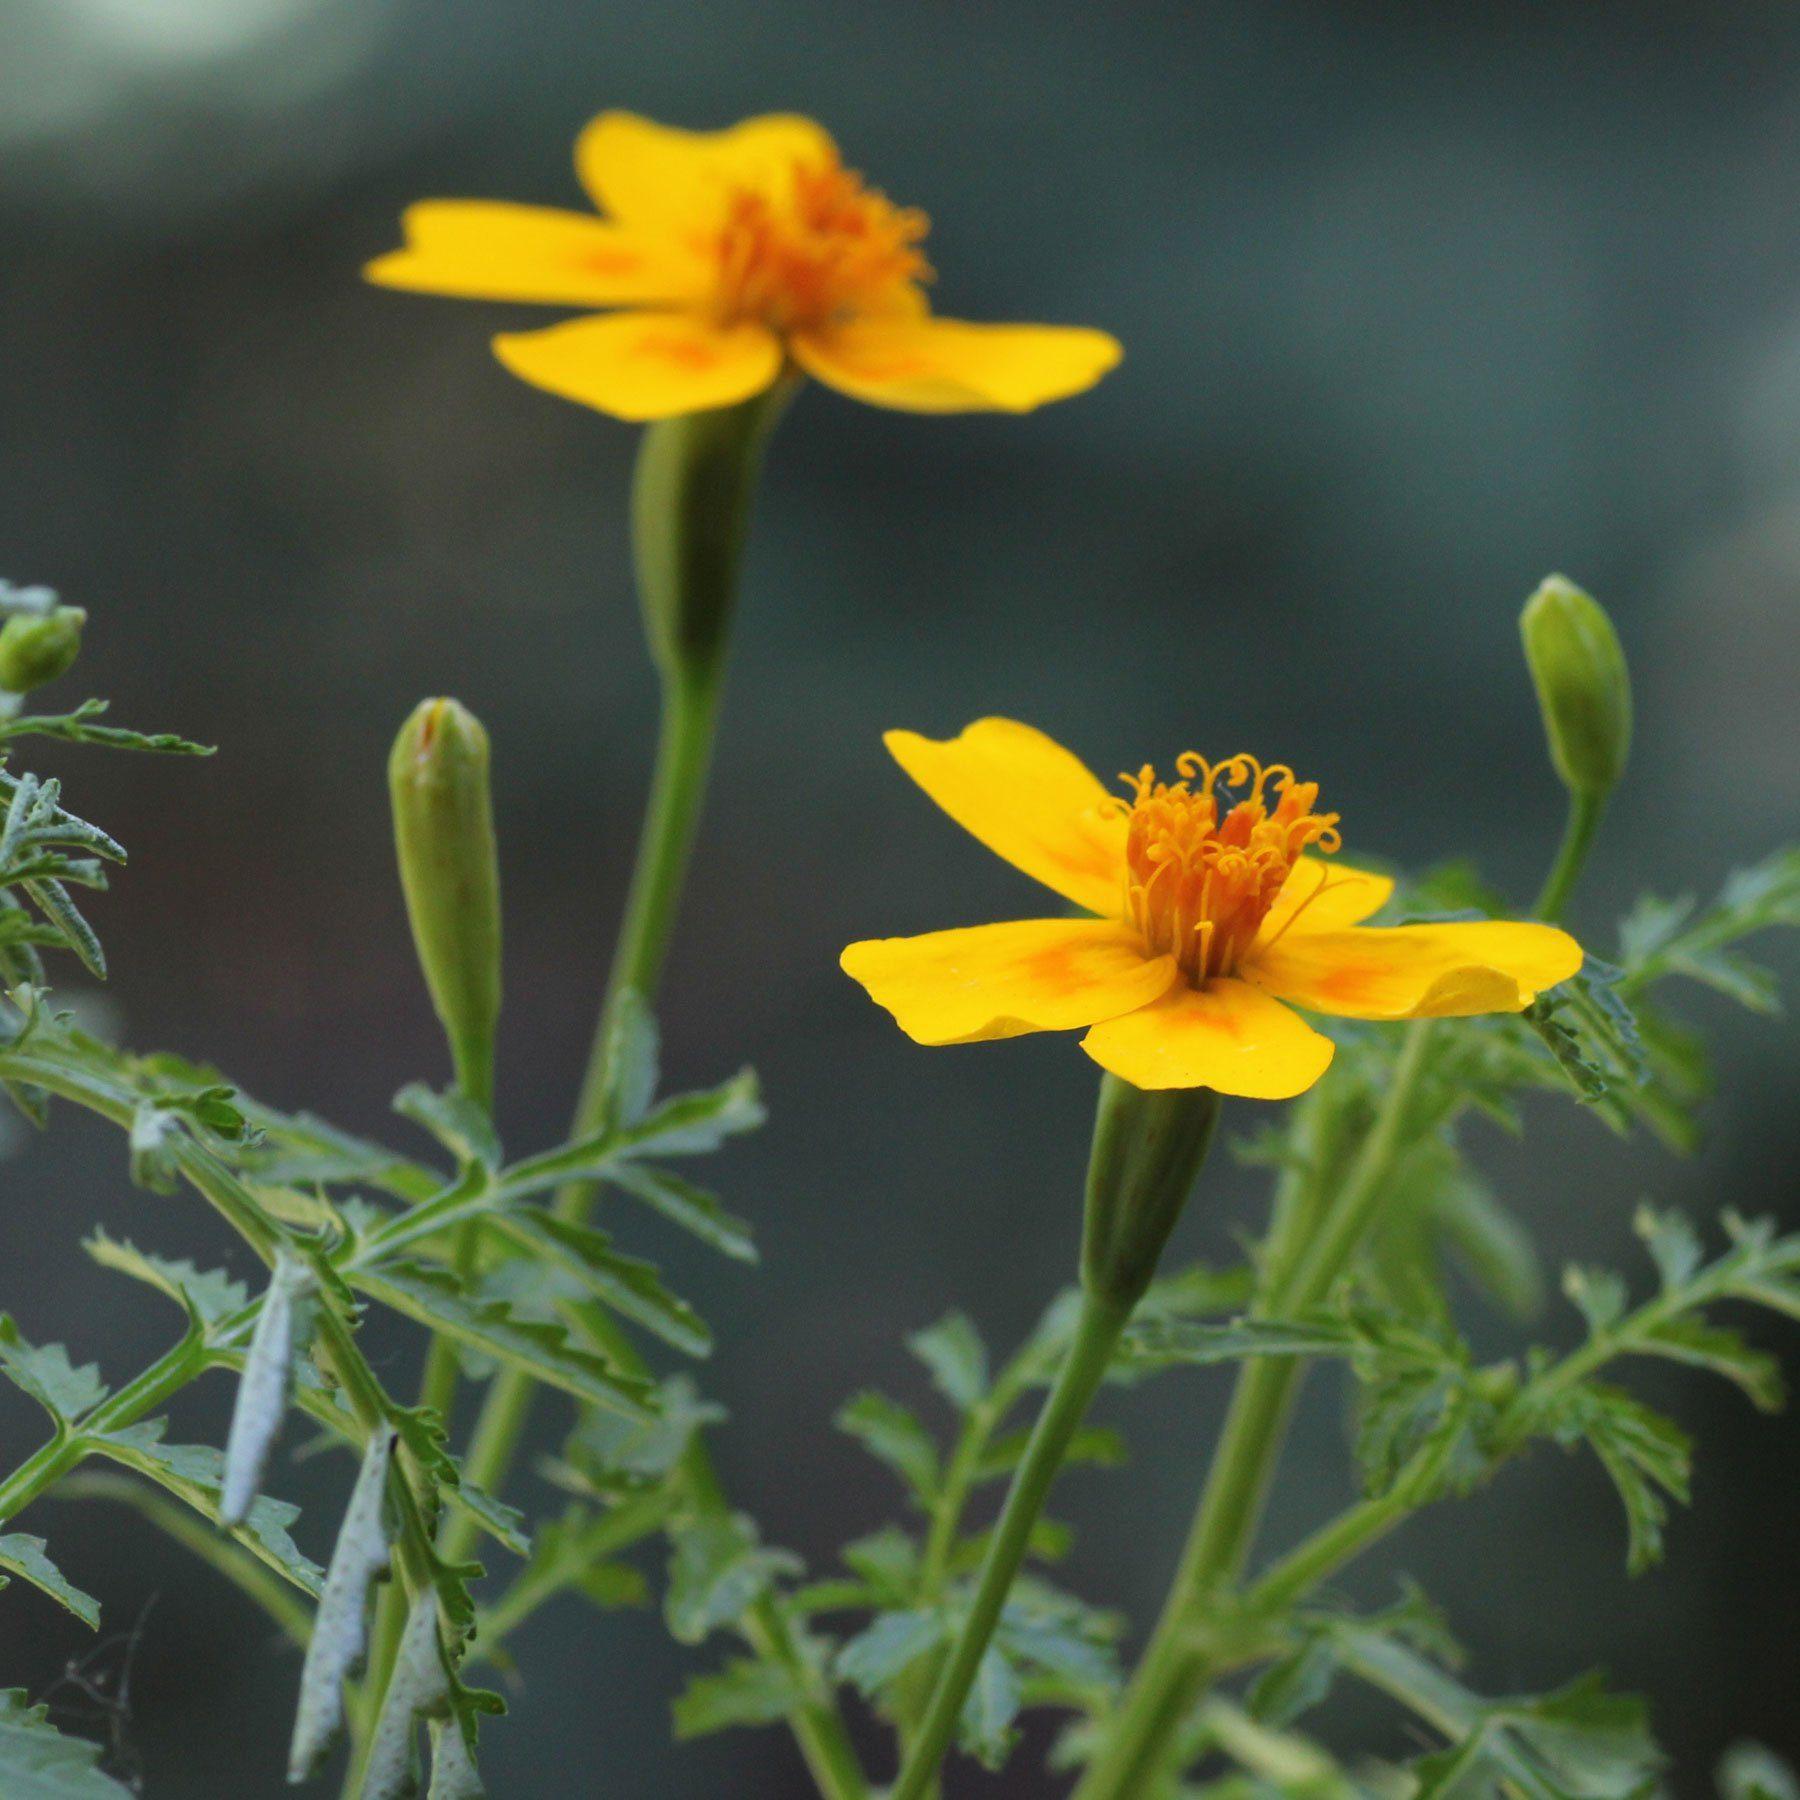 Tagetes filifolia